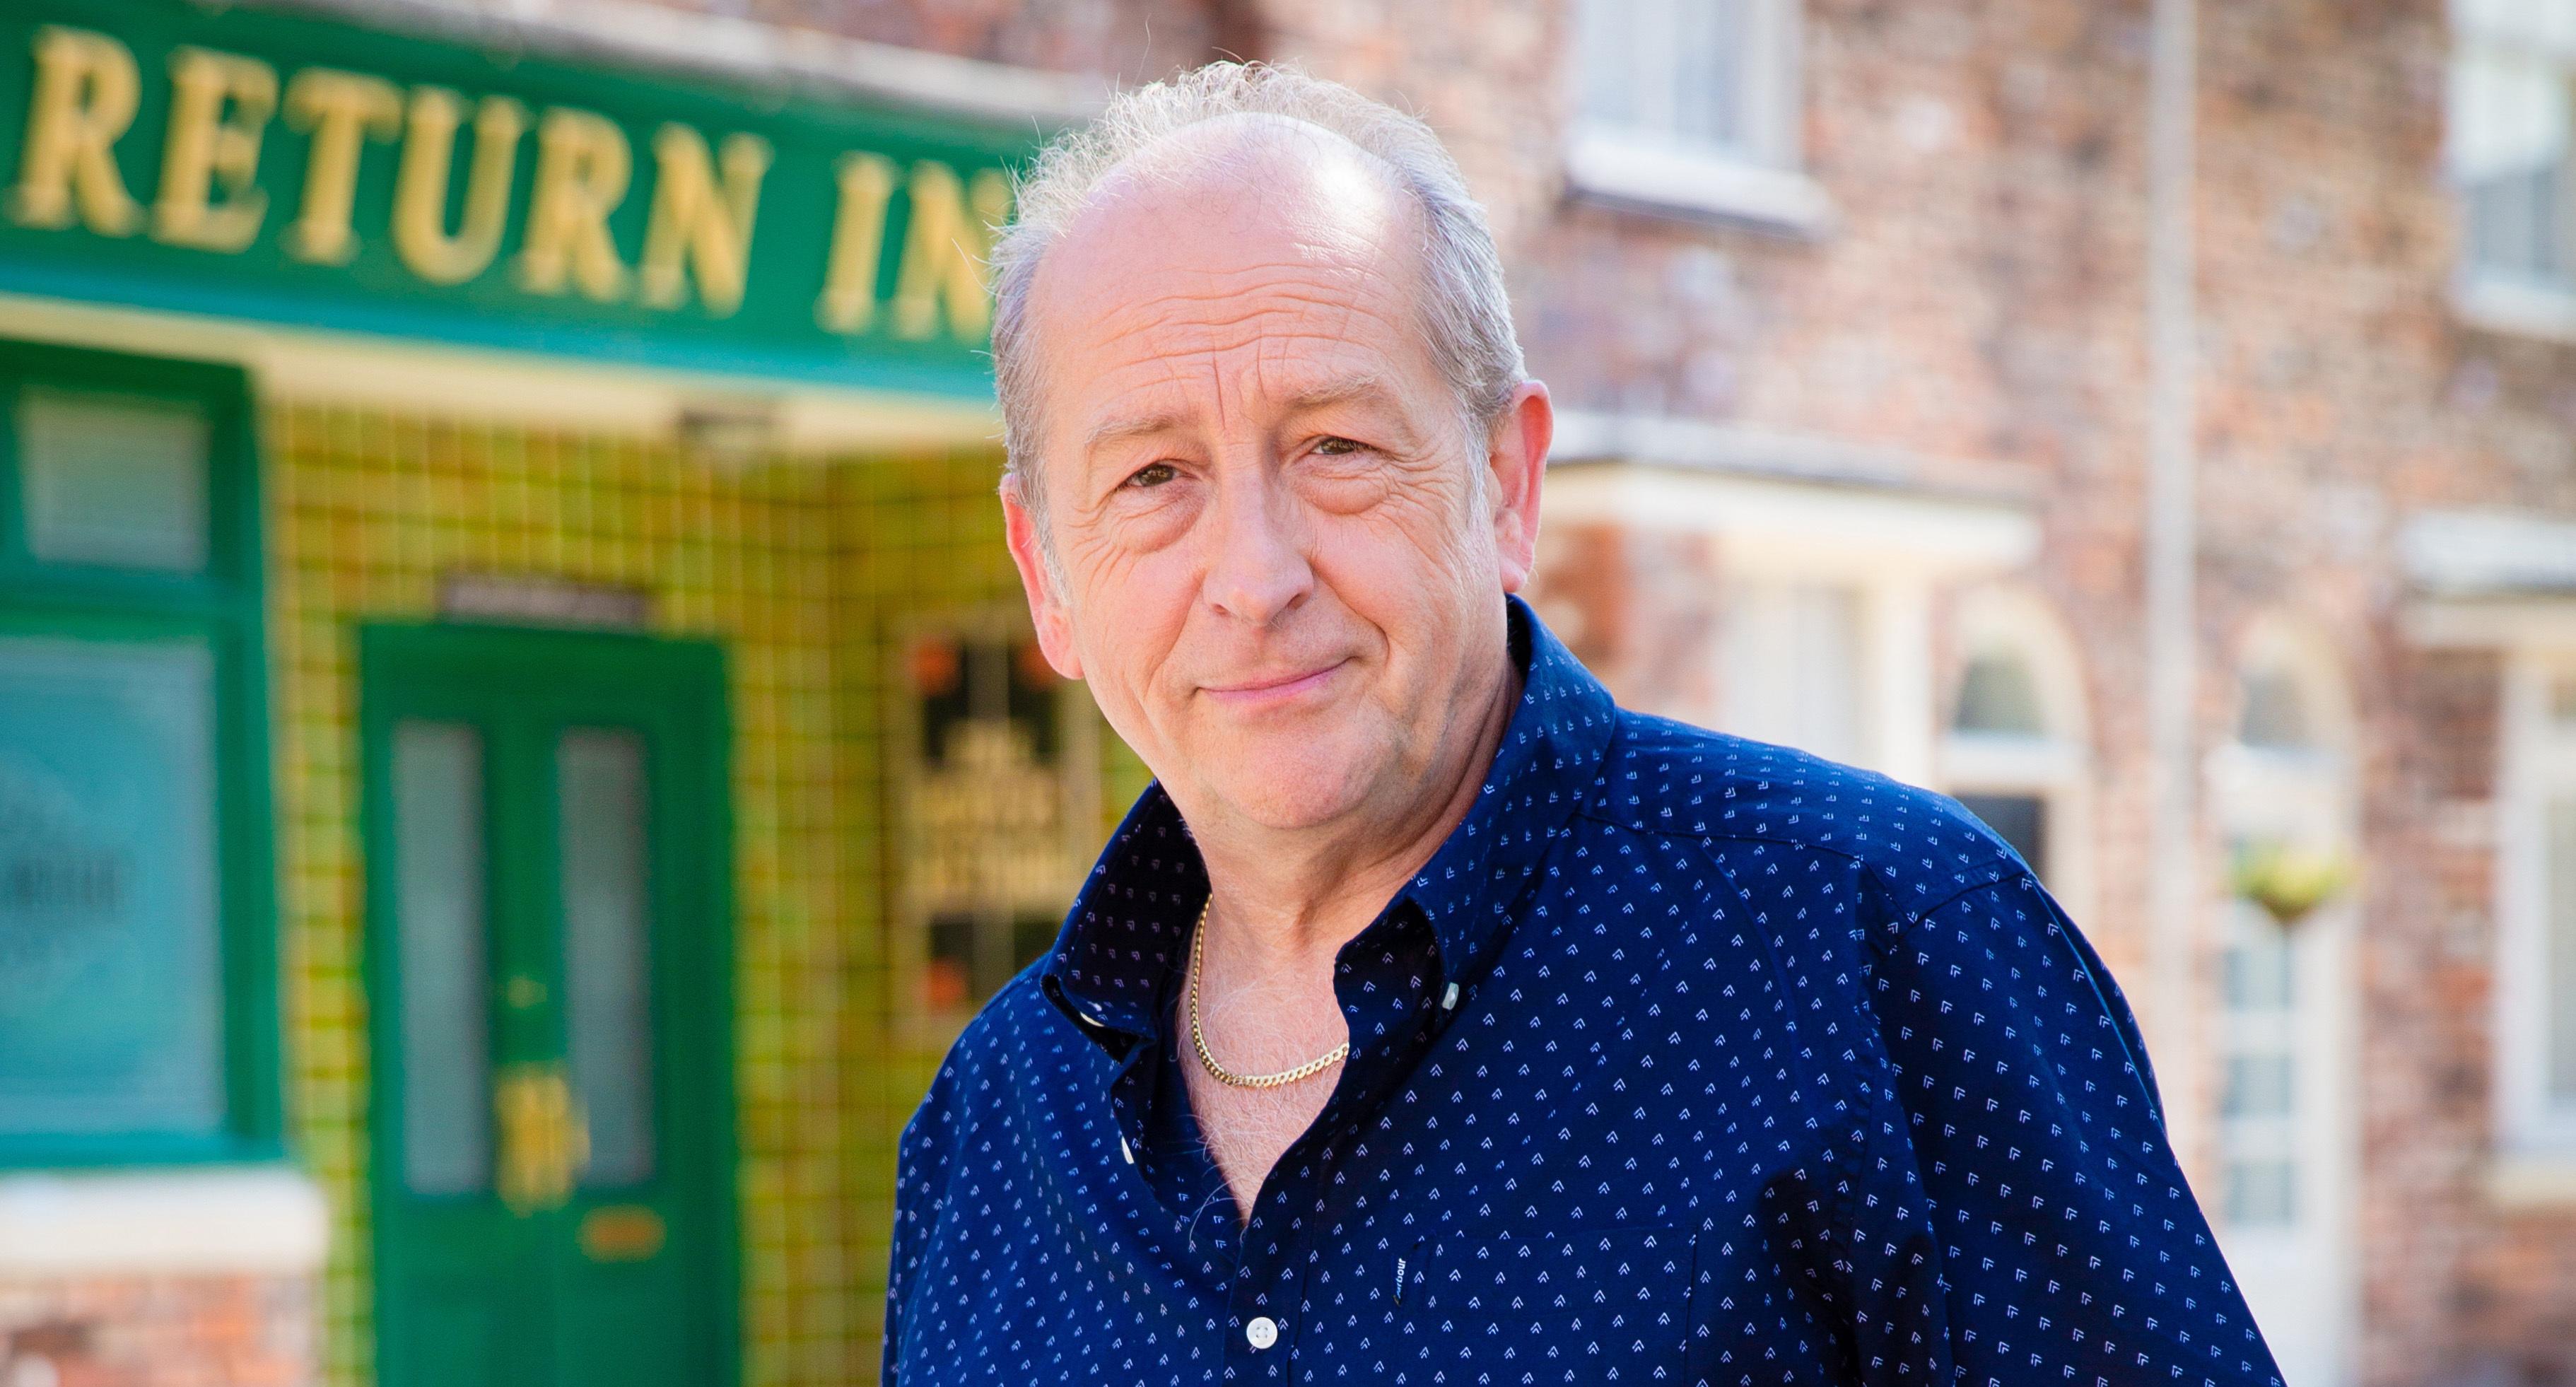 Ian Bartholomew plays Geoff Metcalfe in Corrie (ITV)